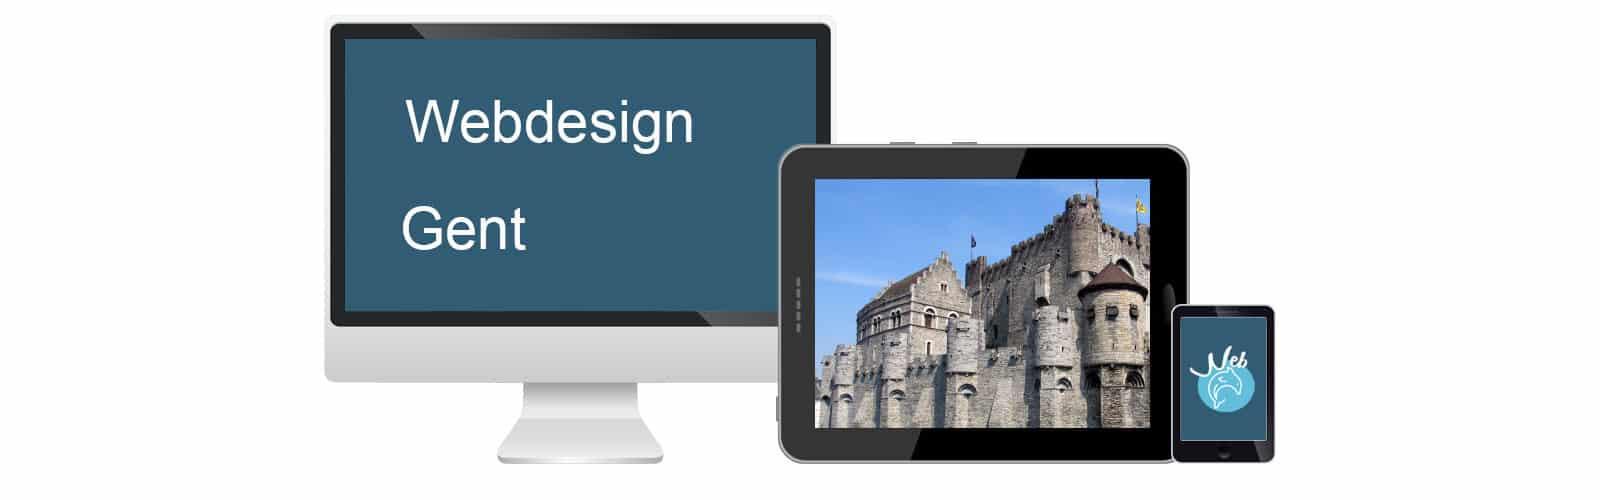 Webdesign Gent - webdolfijn